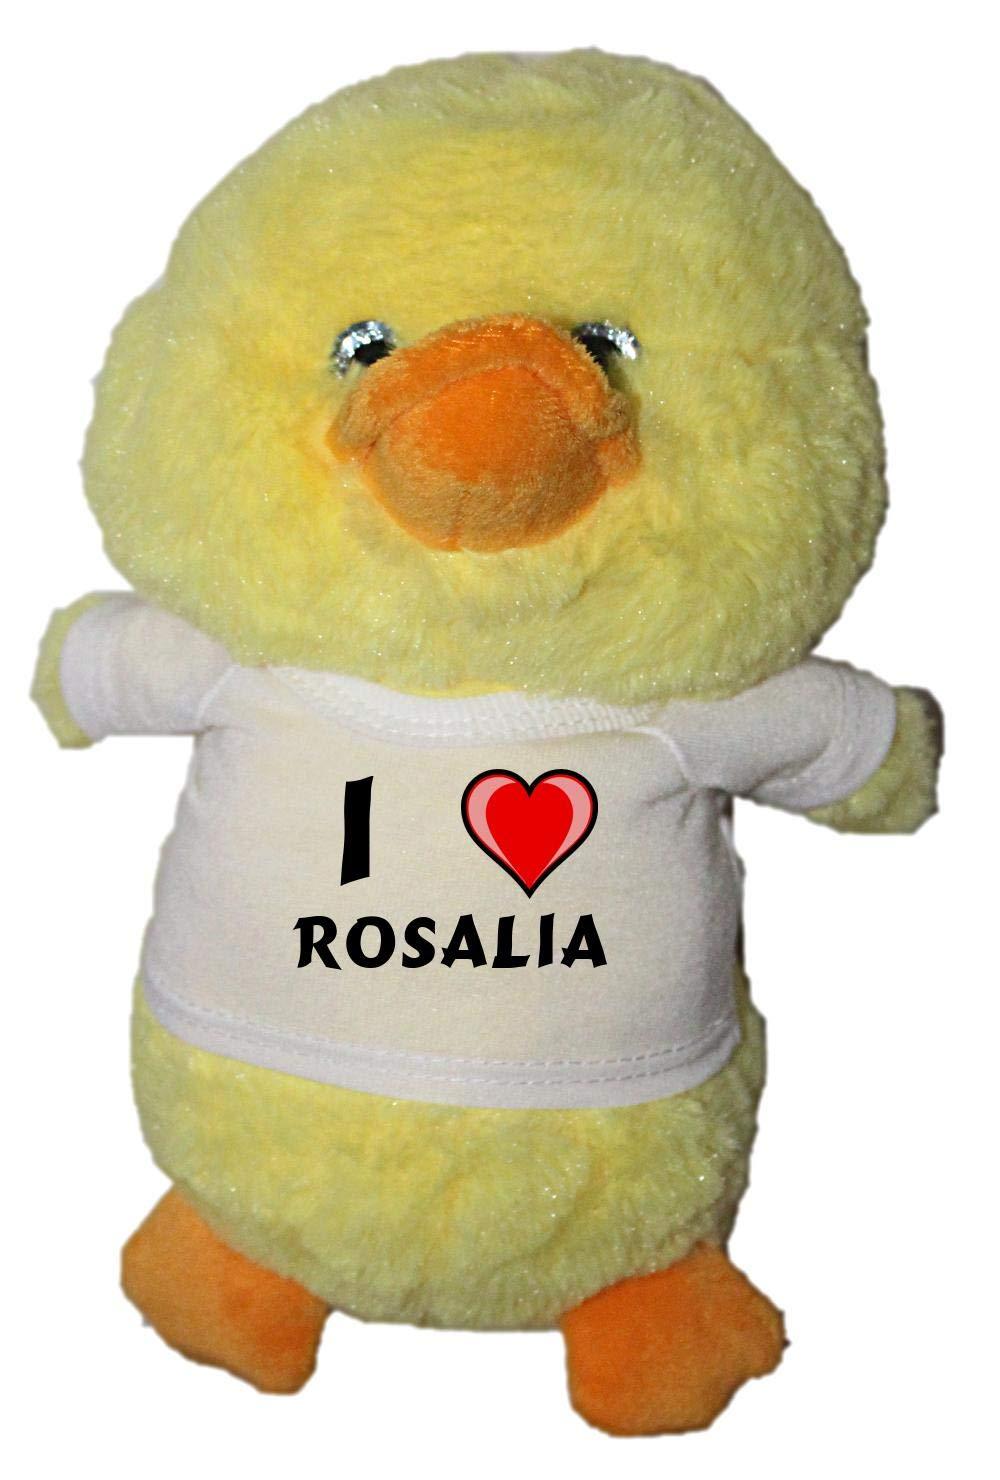 Shopzeus Pato de Peluche (Juguete) con Amo Rosalia en la Camiseta ...